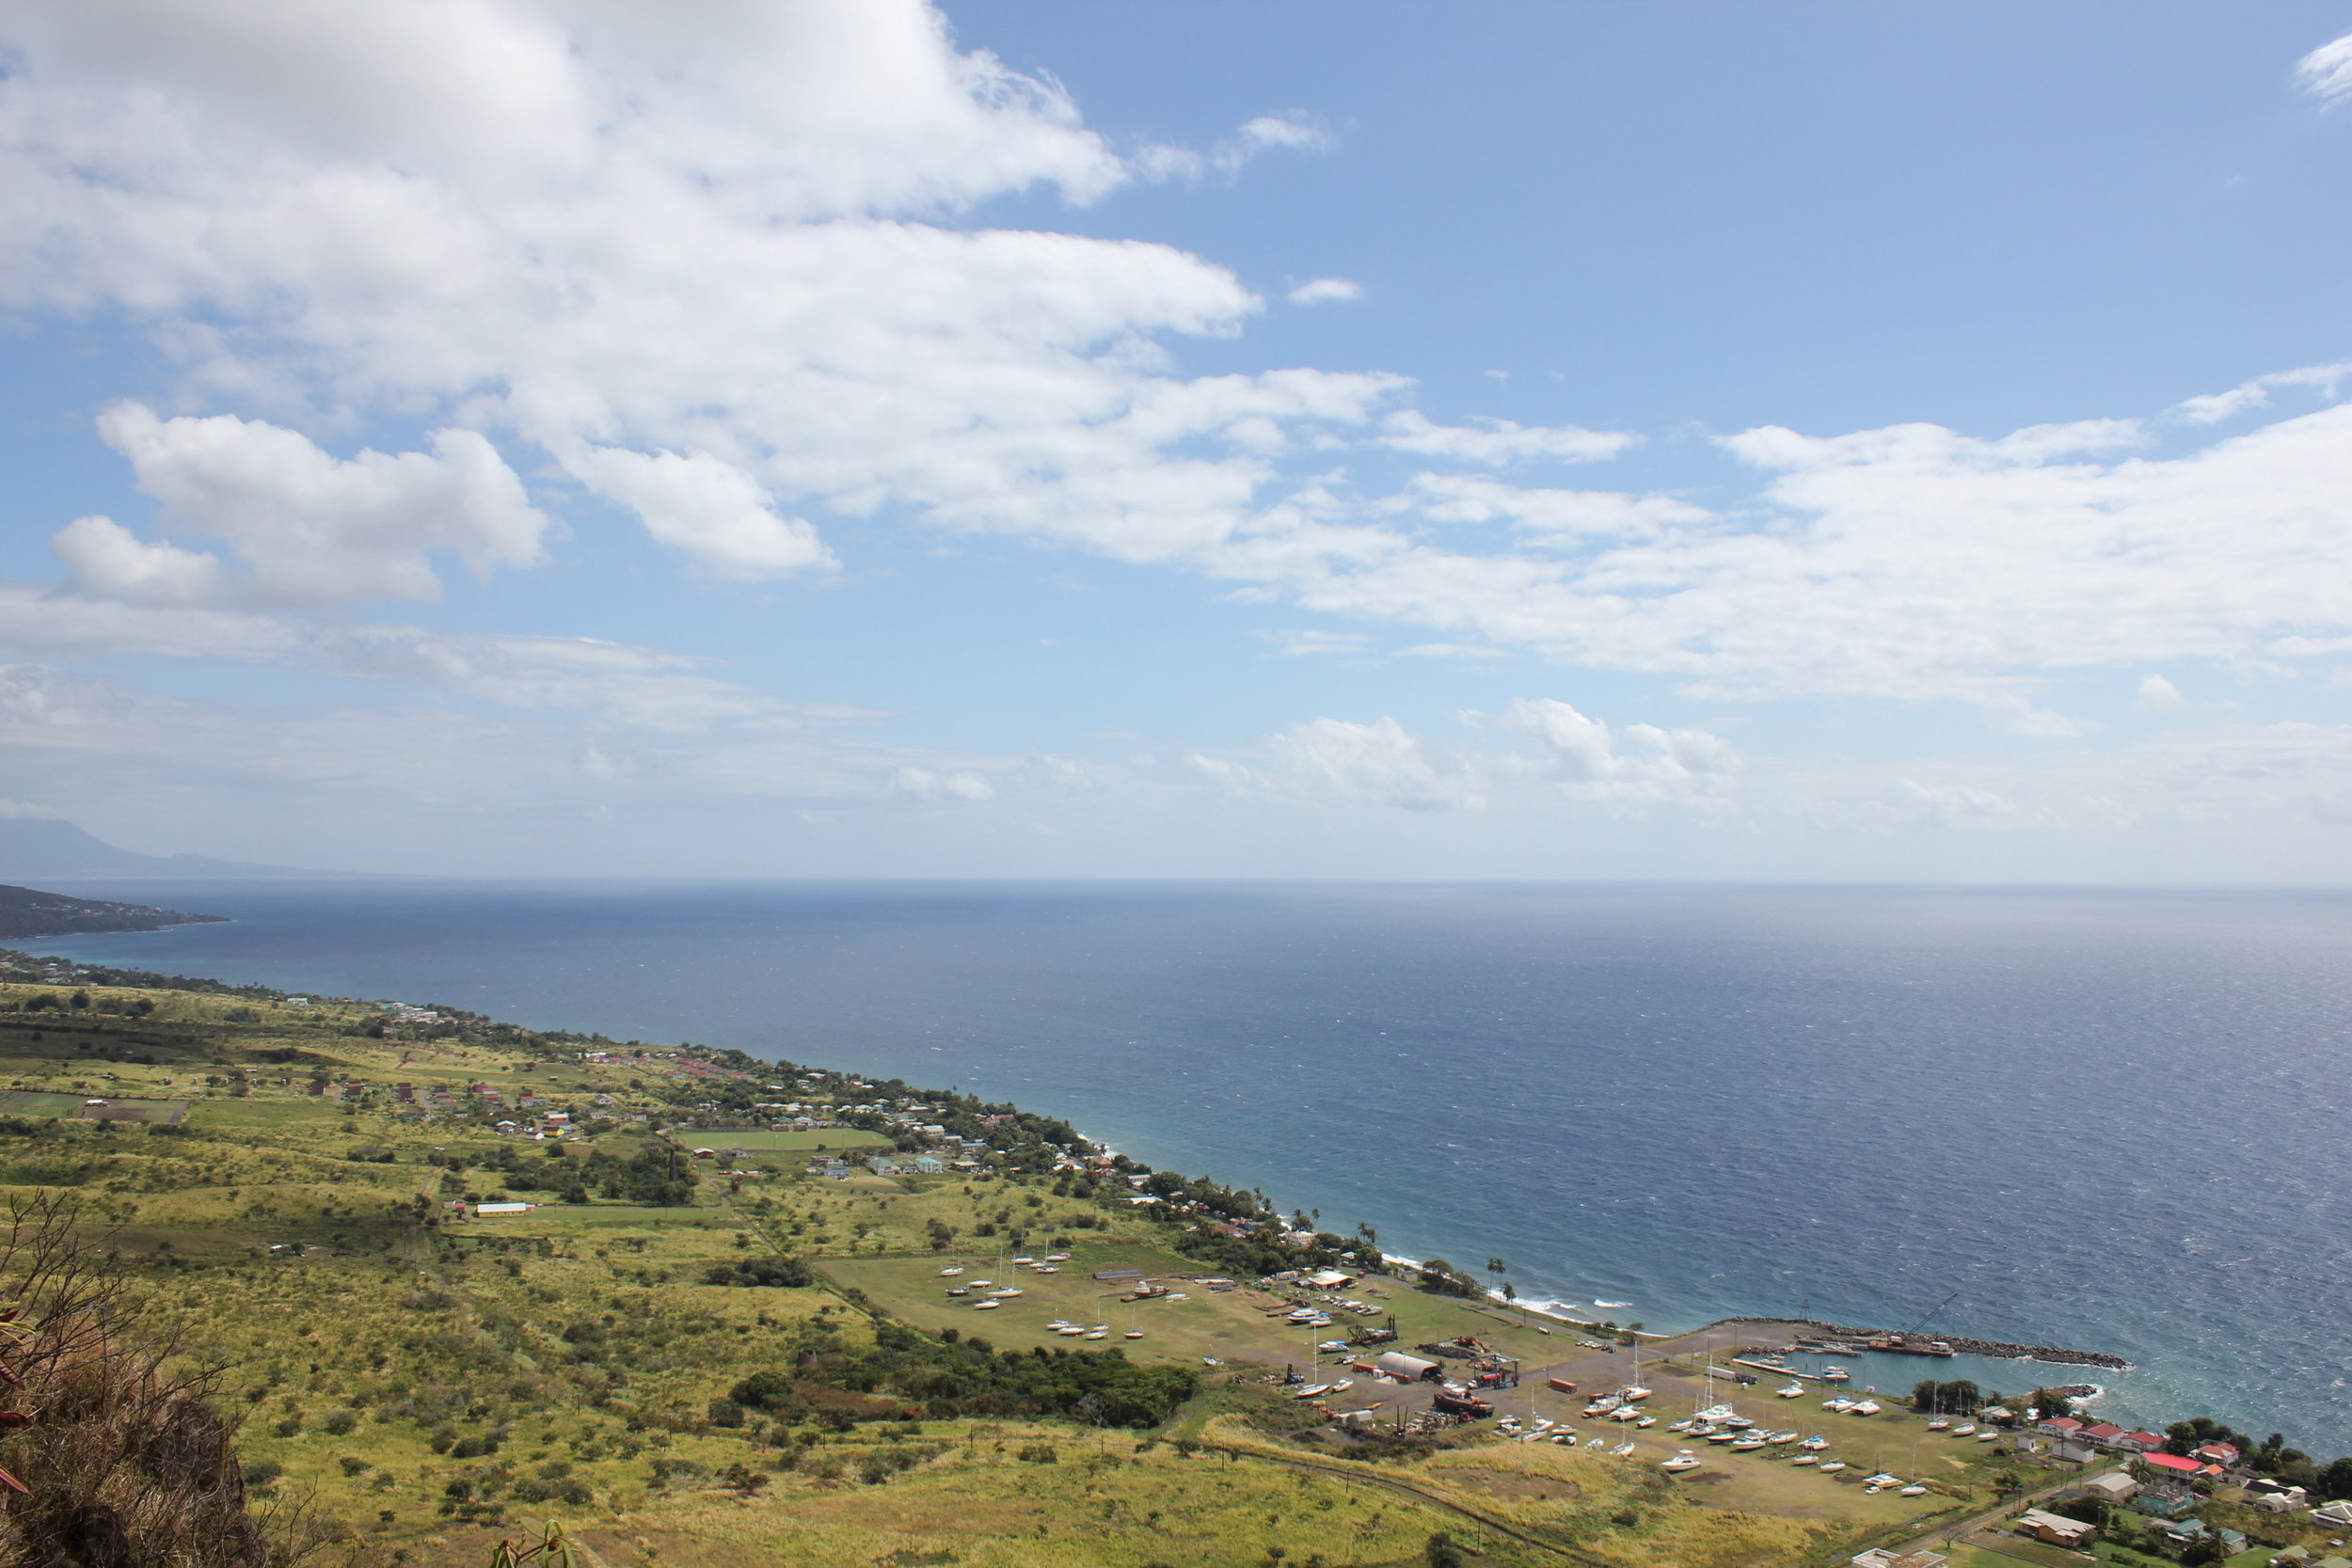 Brimstone Hill Fortress National Park – Views of Caribbean Sea